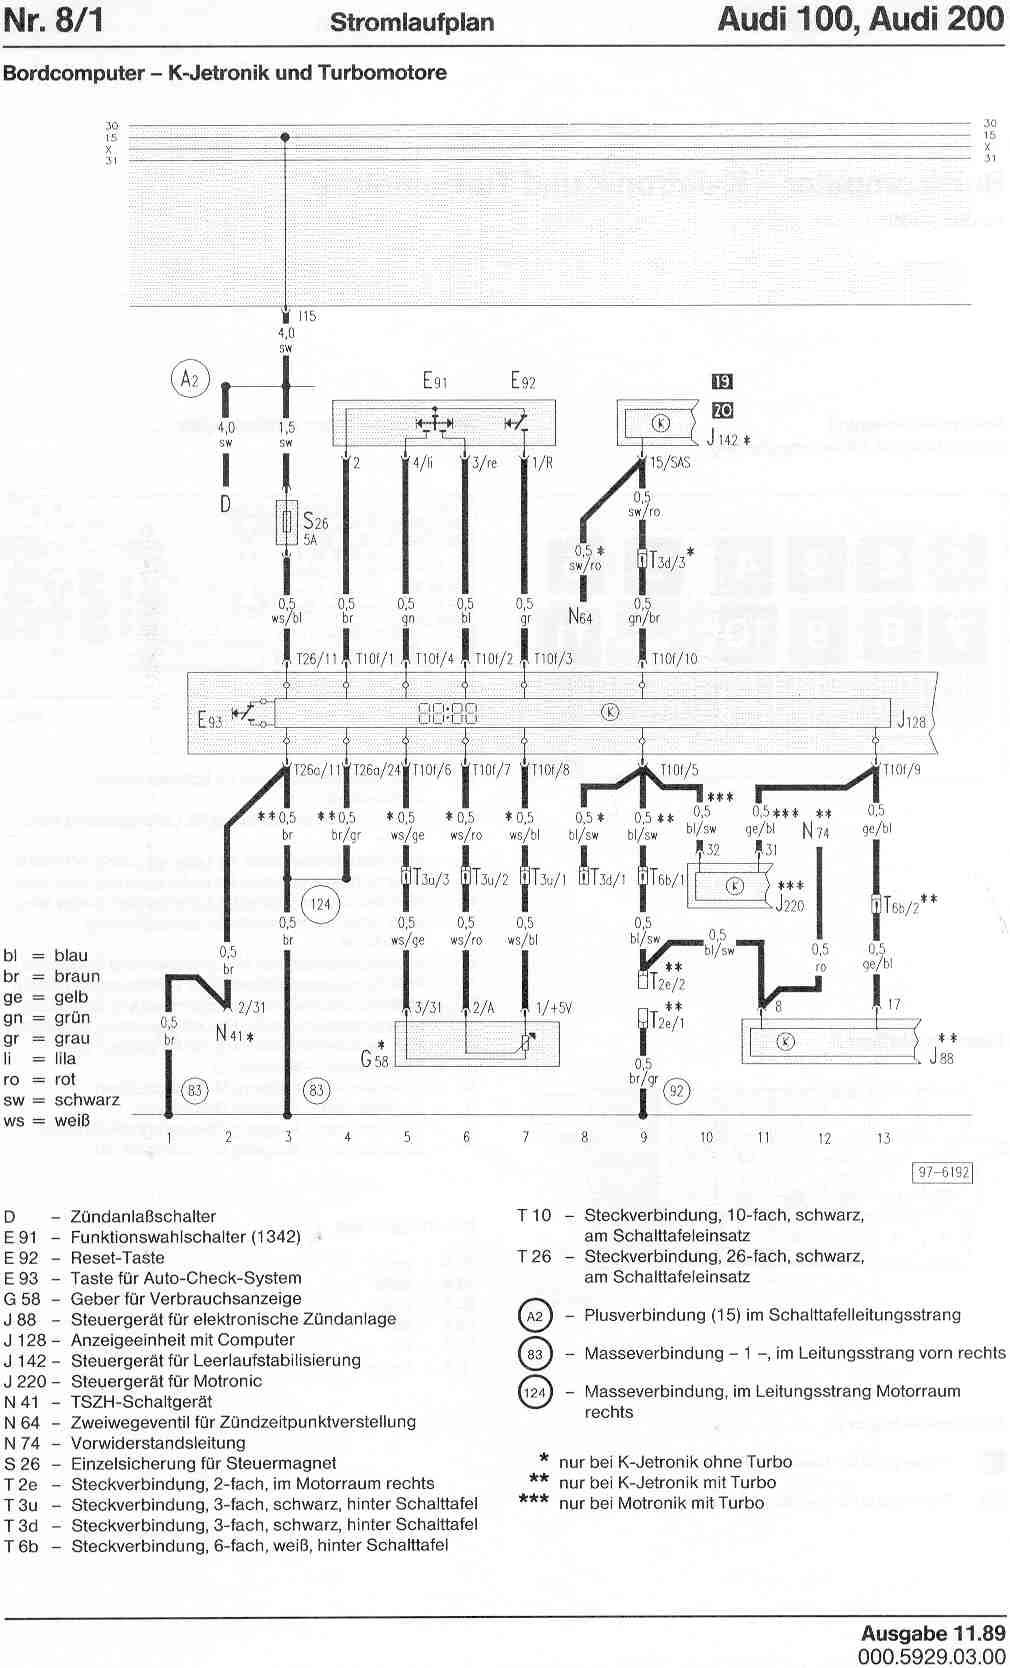 audi 100 200 factory wiring diagrams rh sizov org audi 100 c3 wiring diagram audi 100 2.5 tdi wiring diagrams